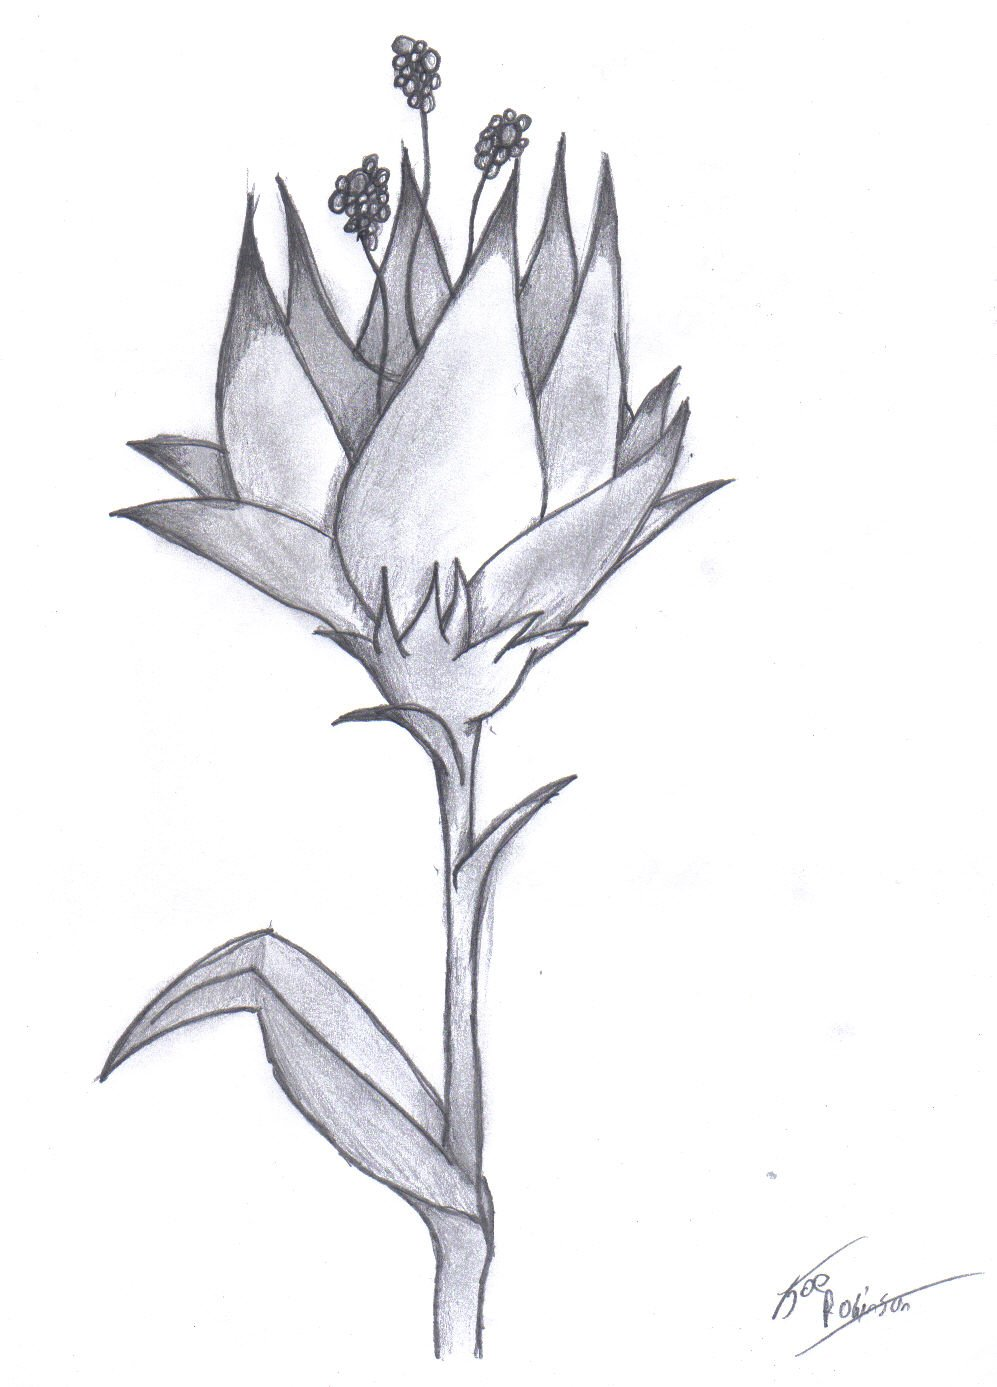 Картинки каменный цветок карандашом, рабочий стол